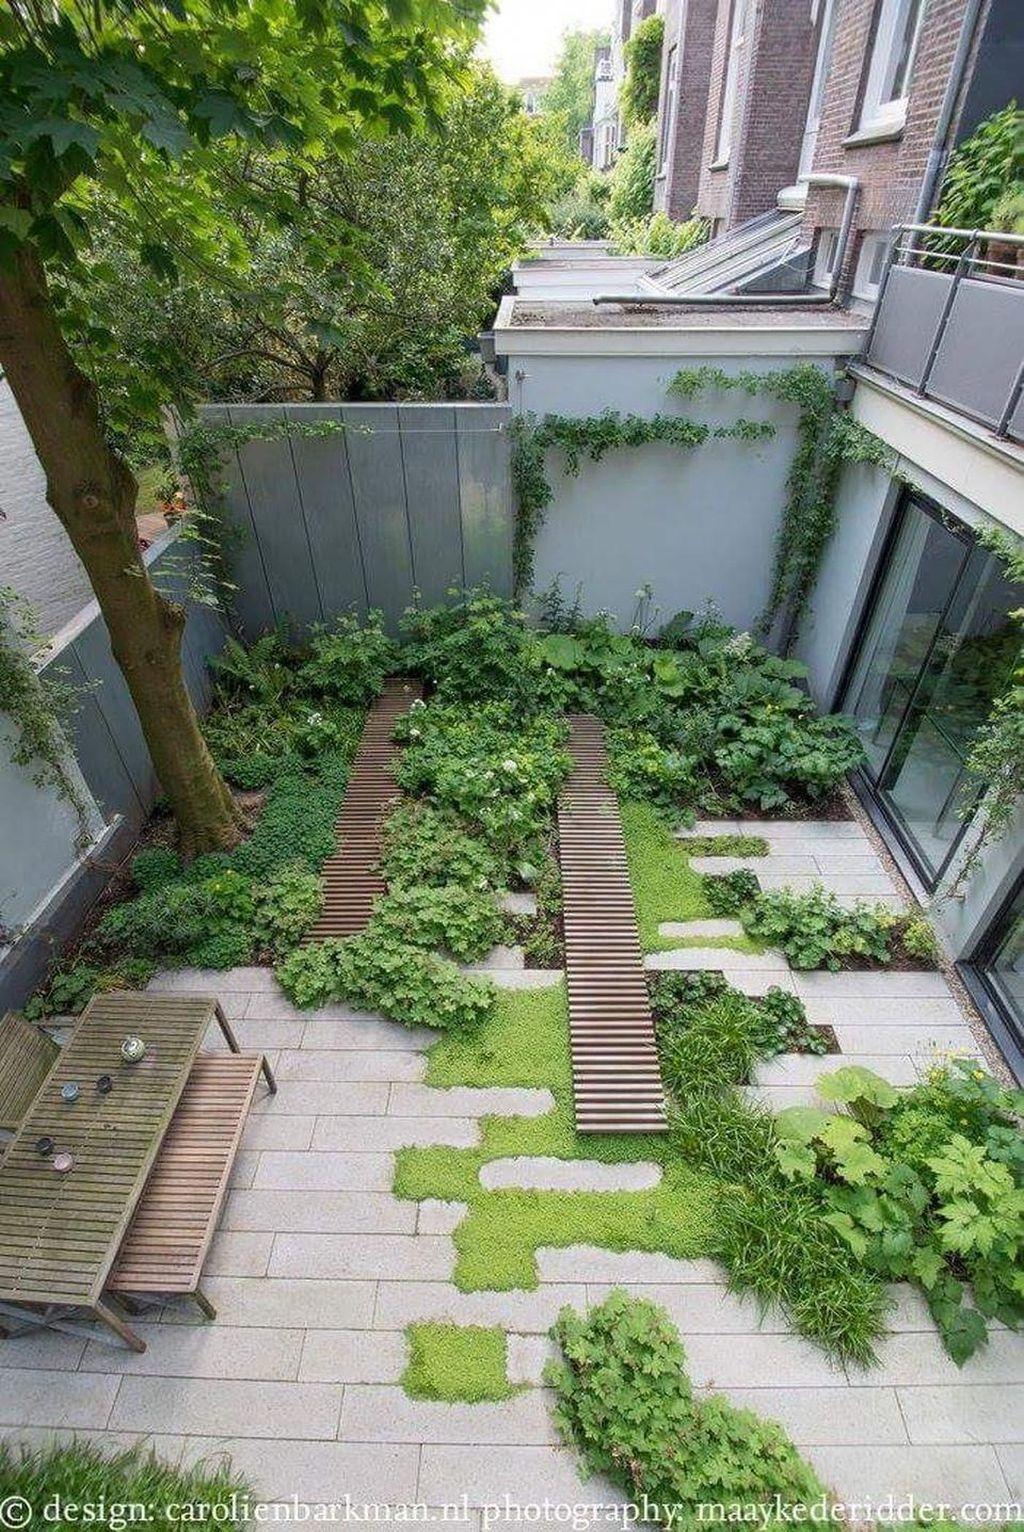 The Best Urban Garden Design Ideas For Your Backyard 30